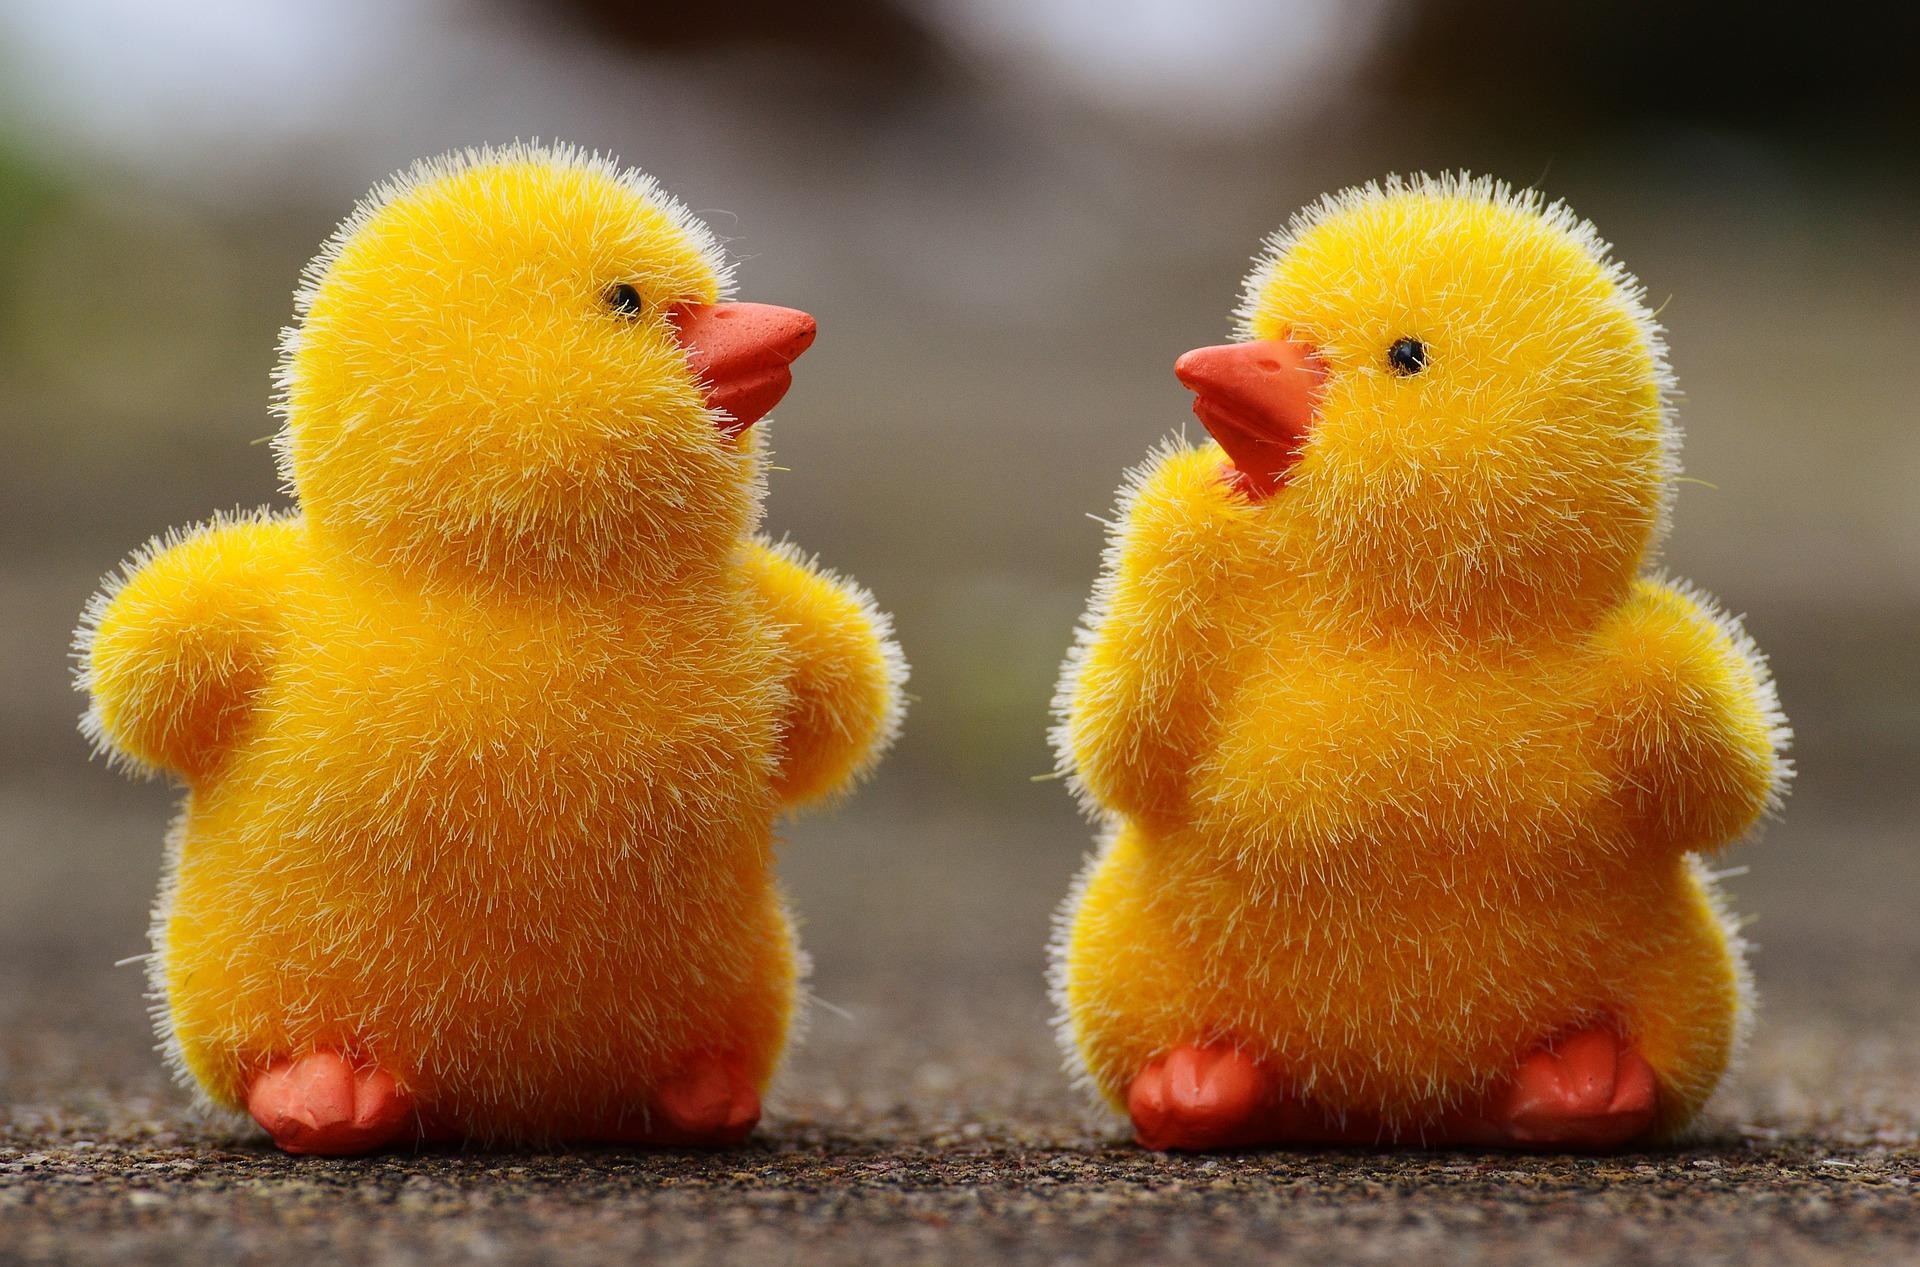 chicks-1159192_1920